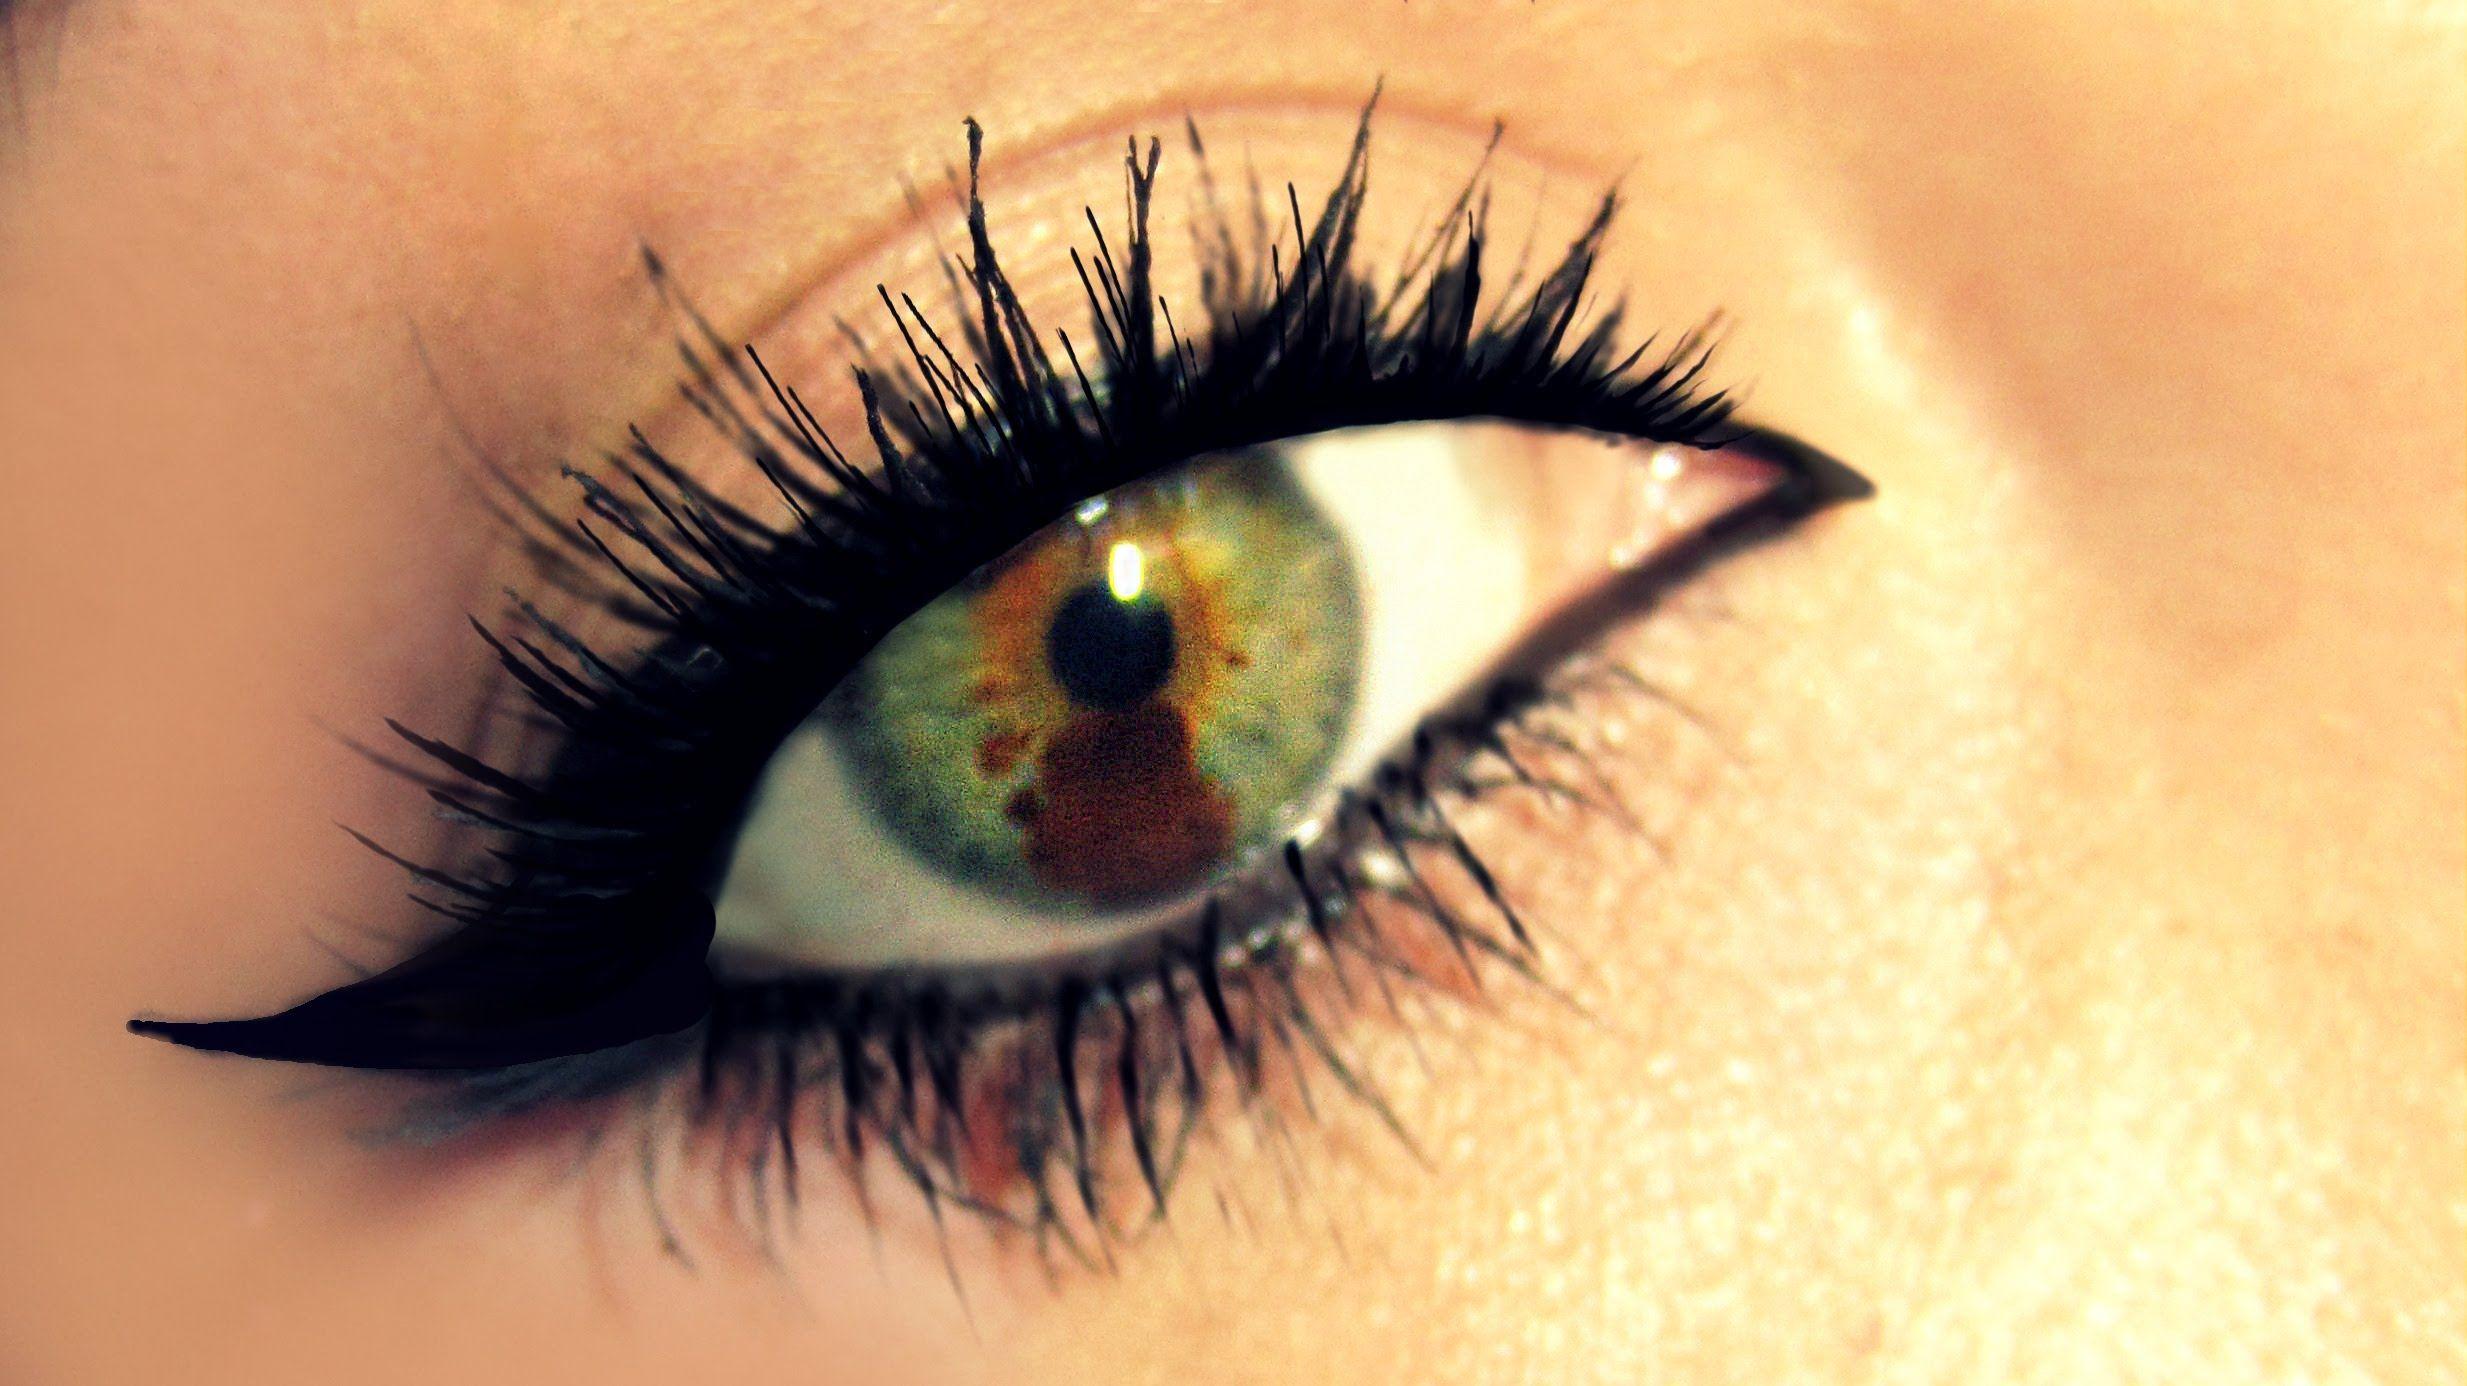 Liquid Eyeliner for Dummies! Hey it's for me! Haha